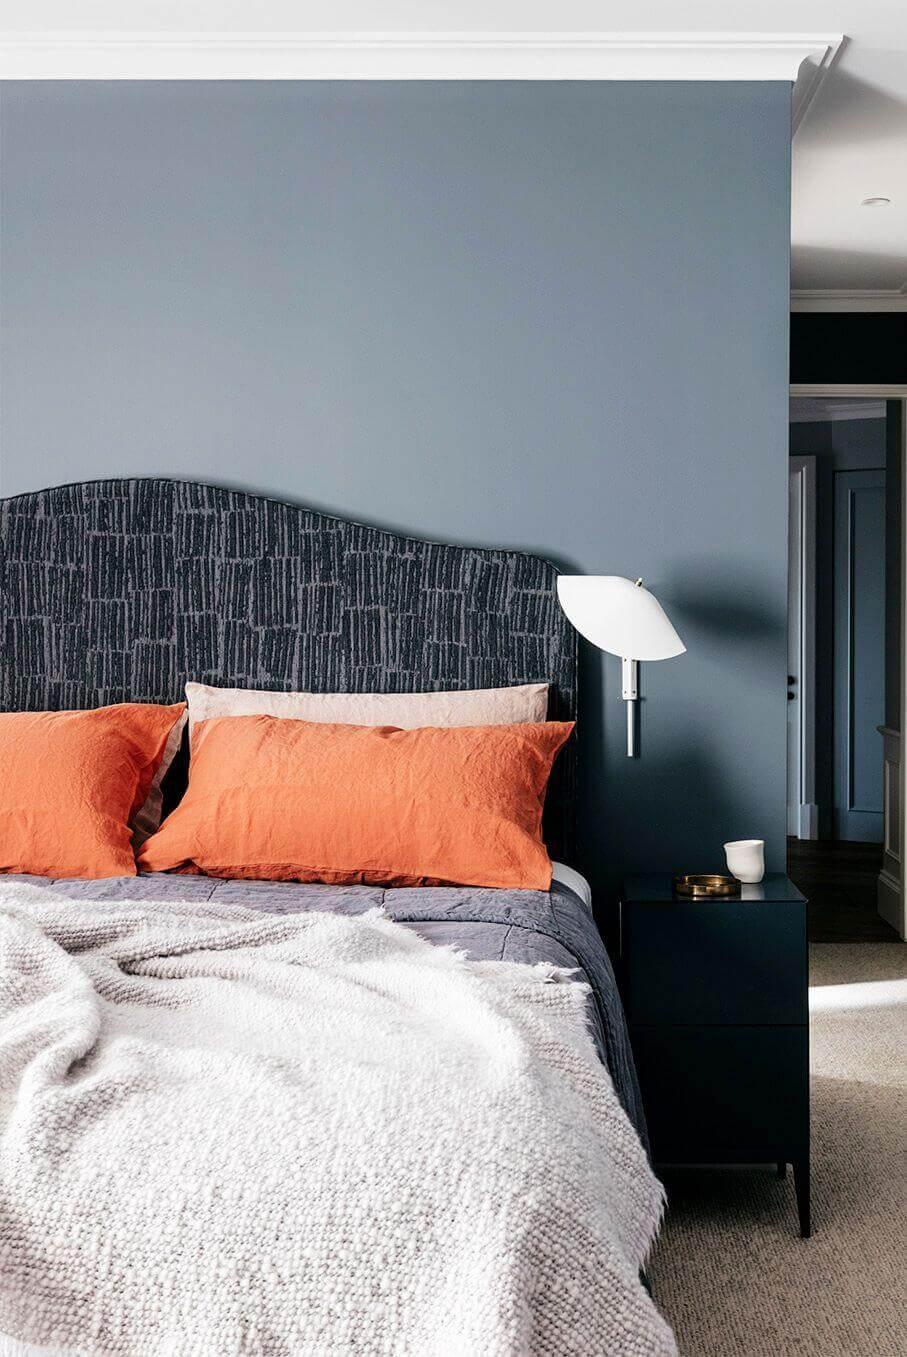 Blue Bedroom Ideas 25 Repaint Your Walls